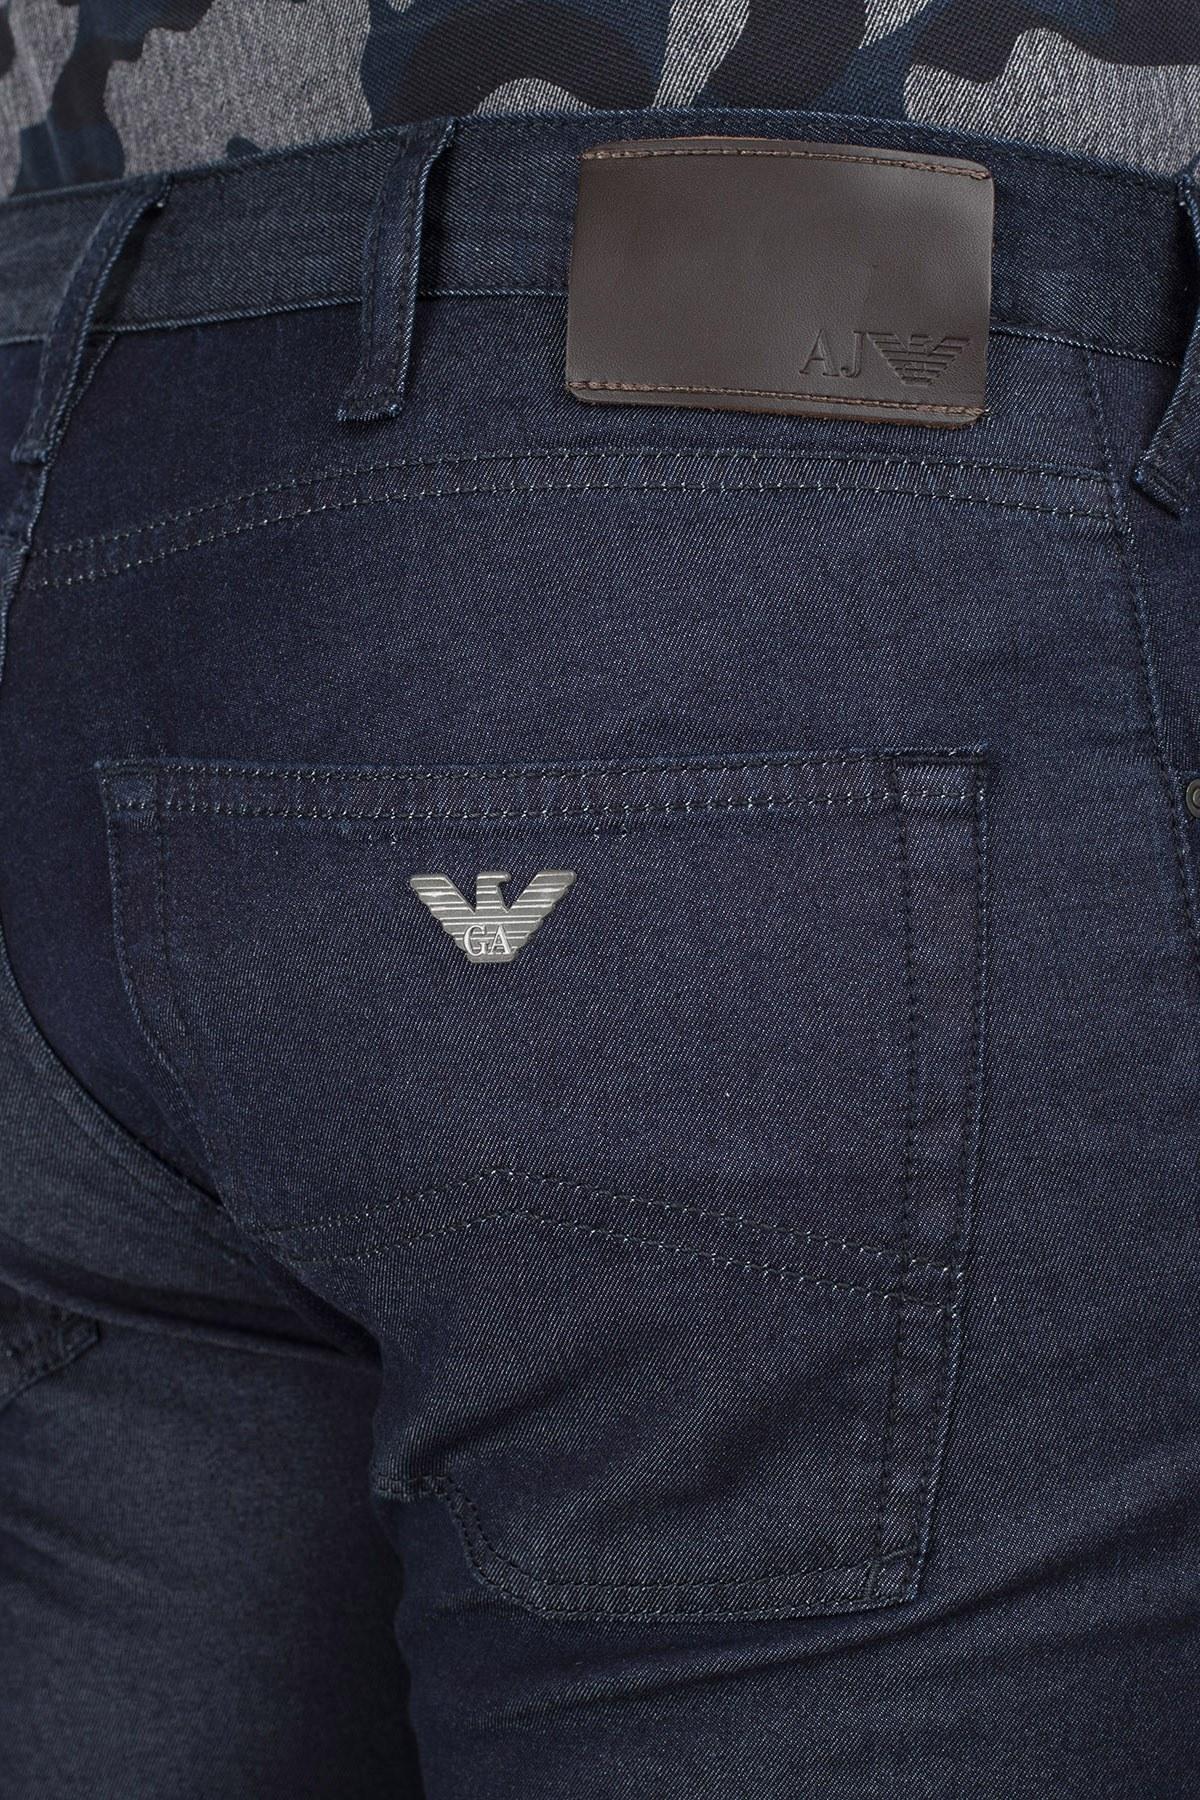 Armani J45 Jeans Erkek Kot Pantolon 8N6J45 6D0KZ 1500 KOYU LACIVERT